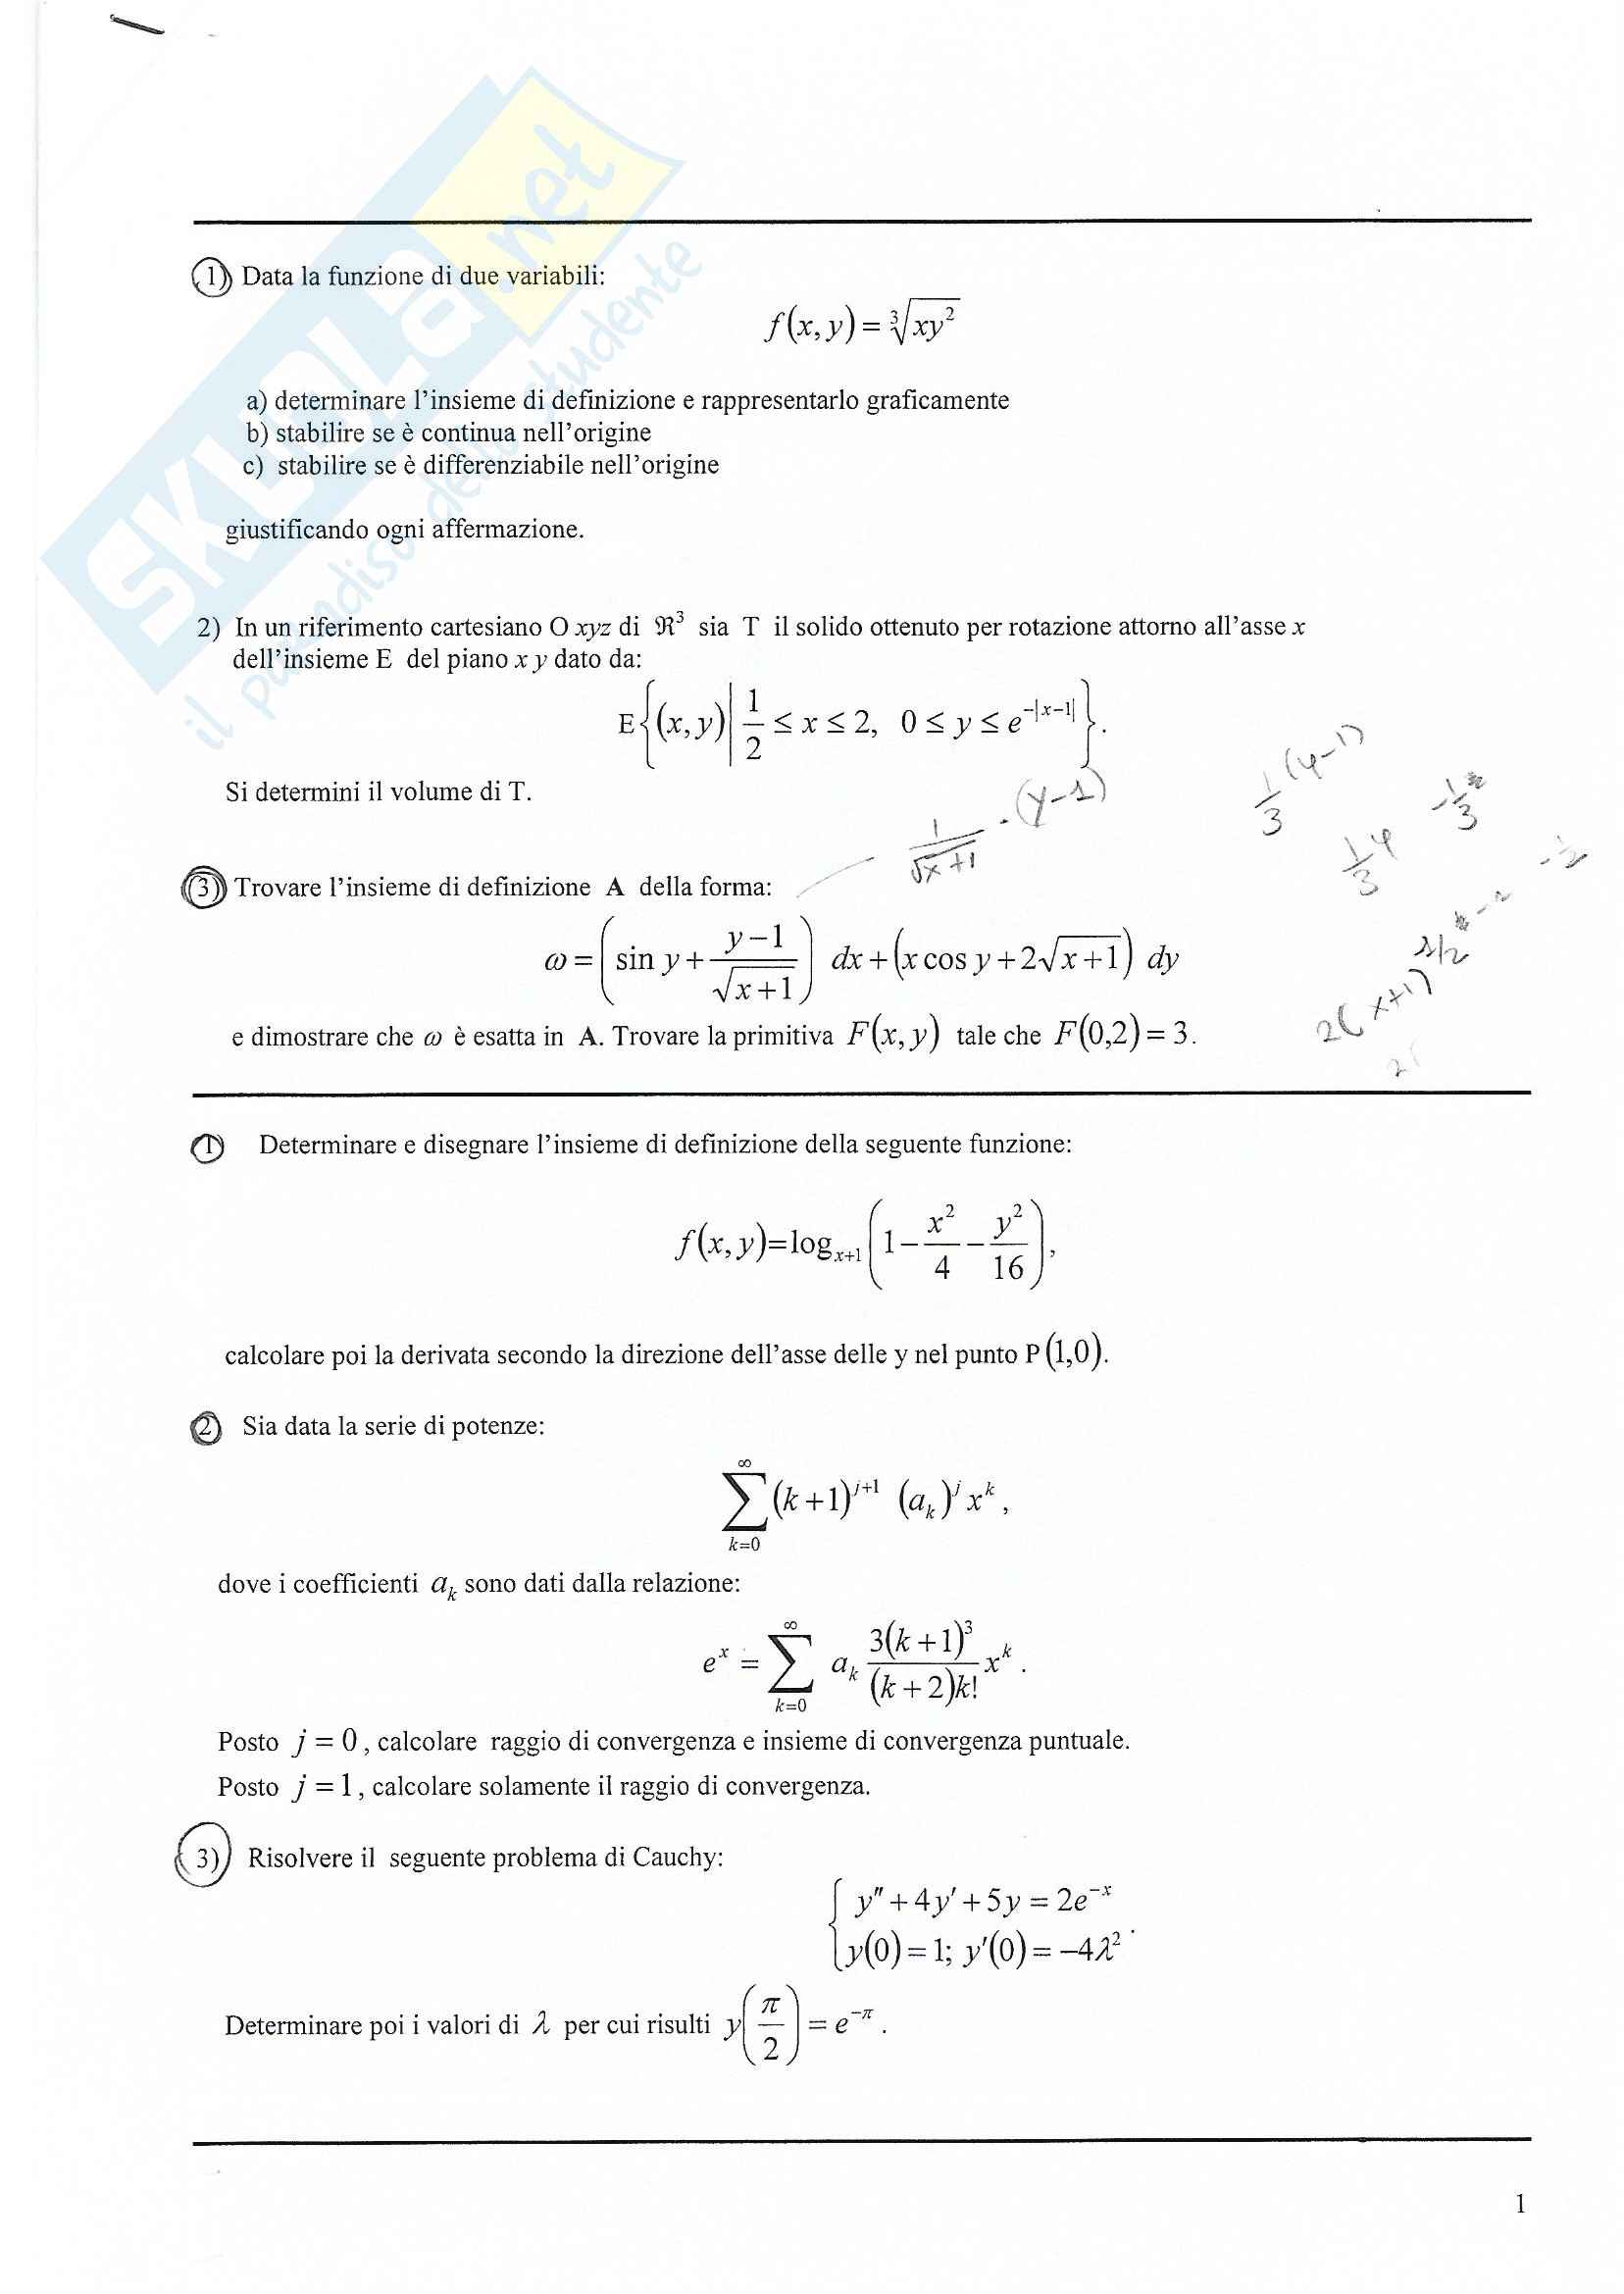 Esercizi svolti: Esercitazione di Analisi matematica 2